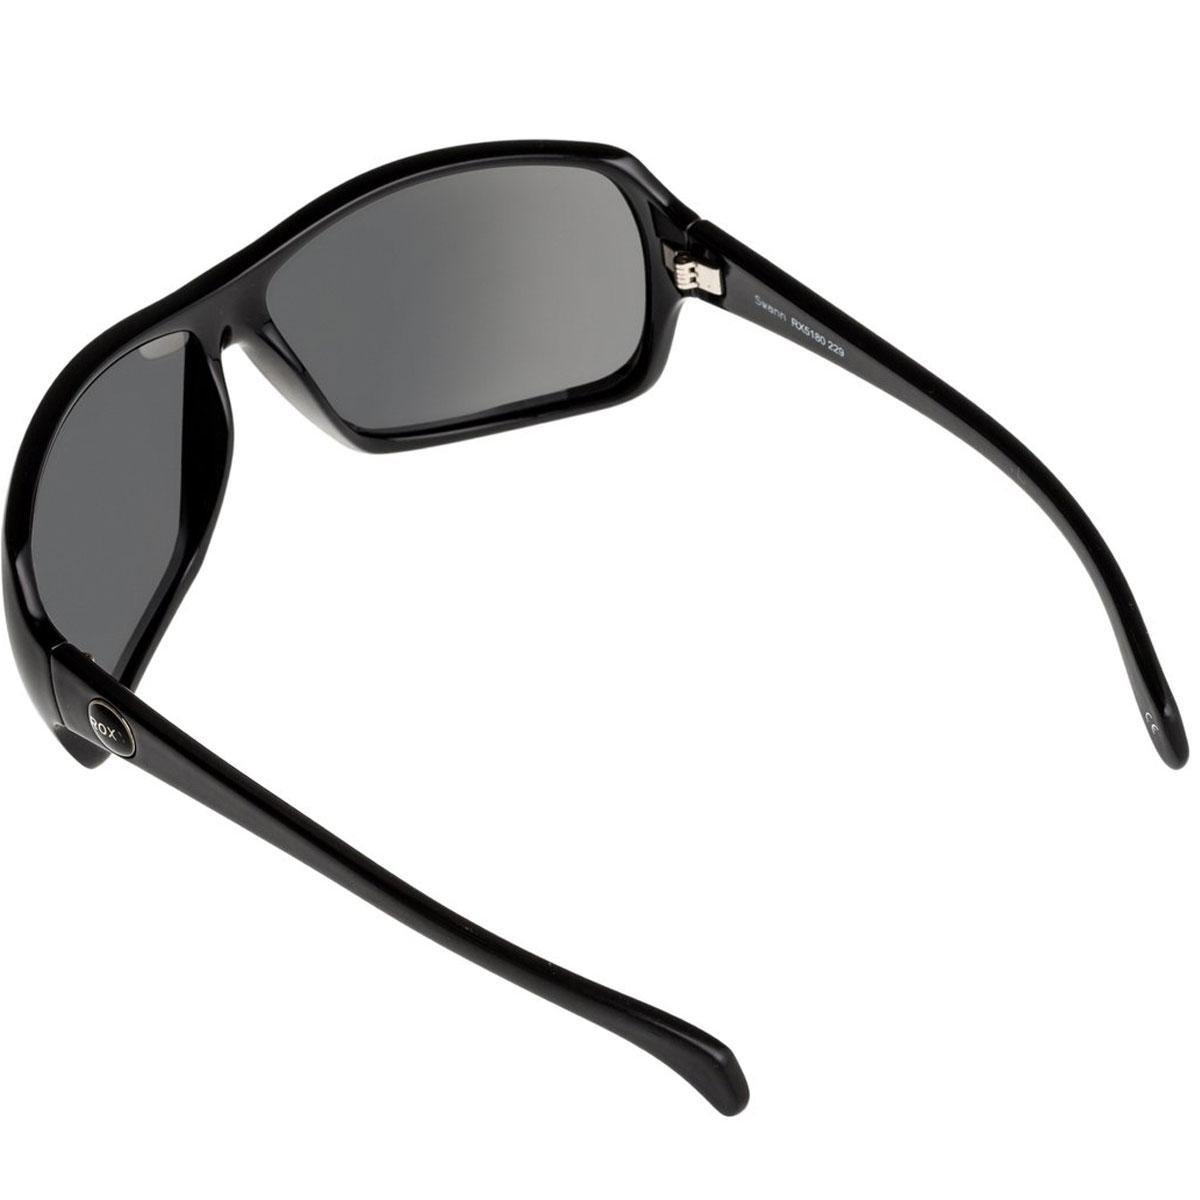 d14e2434357d8 Óculos Roxy Swan - Preto. Vendido e Enviado por cut wave